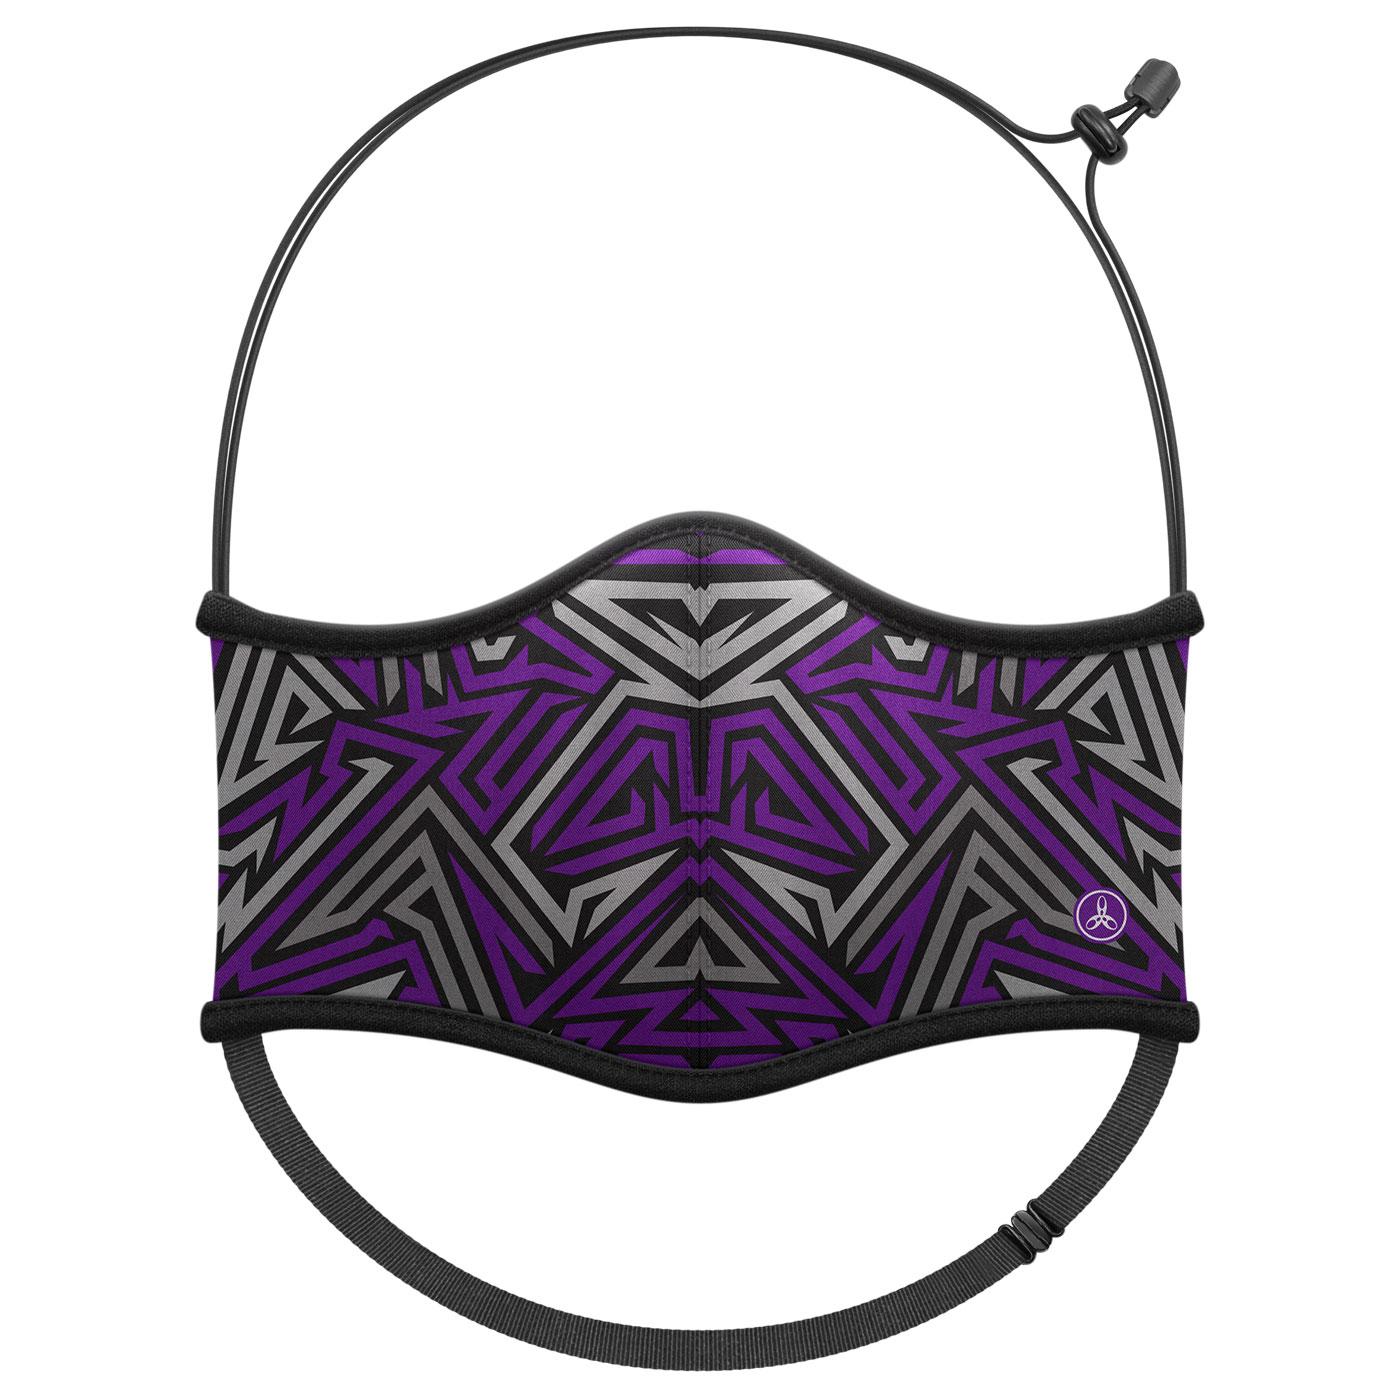 HODARLA 運動舒適口罩6032219 - 紫灰